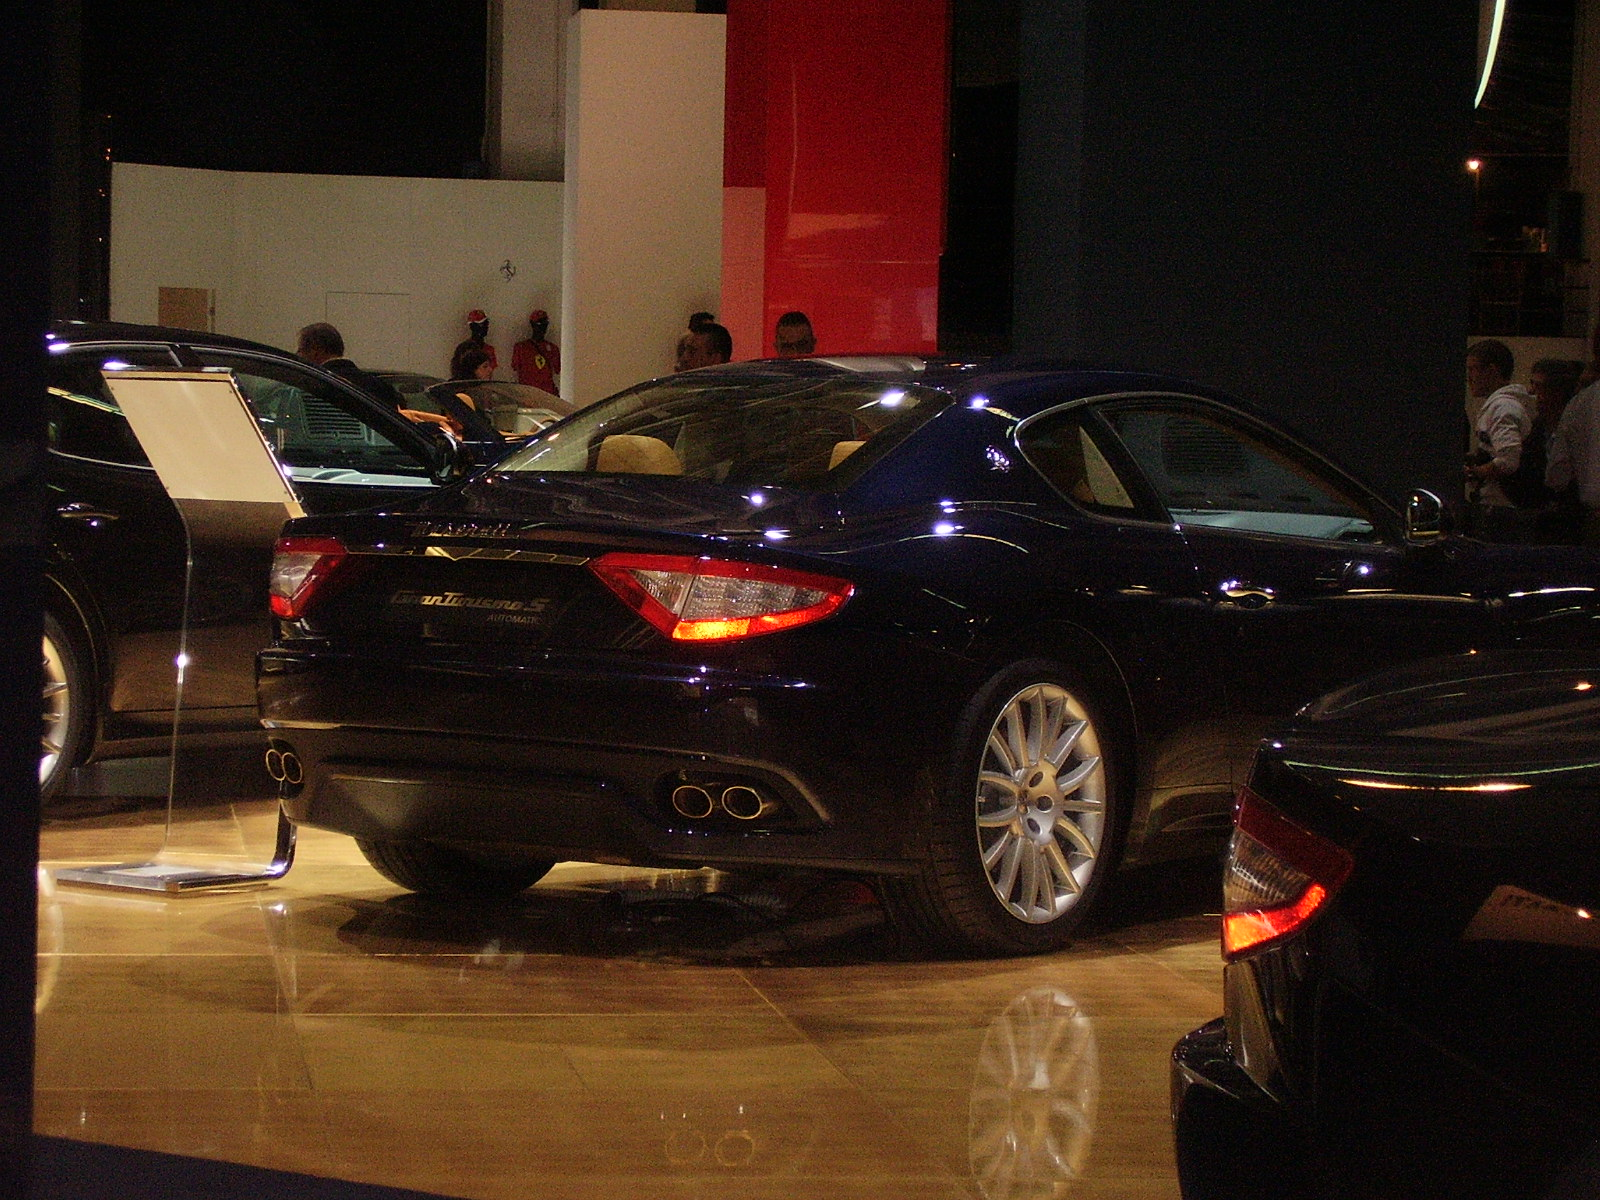 Visita Salon Automovil 09 BCN / Visit to Car Exhibition 09 Barcelona-P5140764.JPG